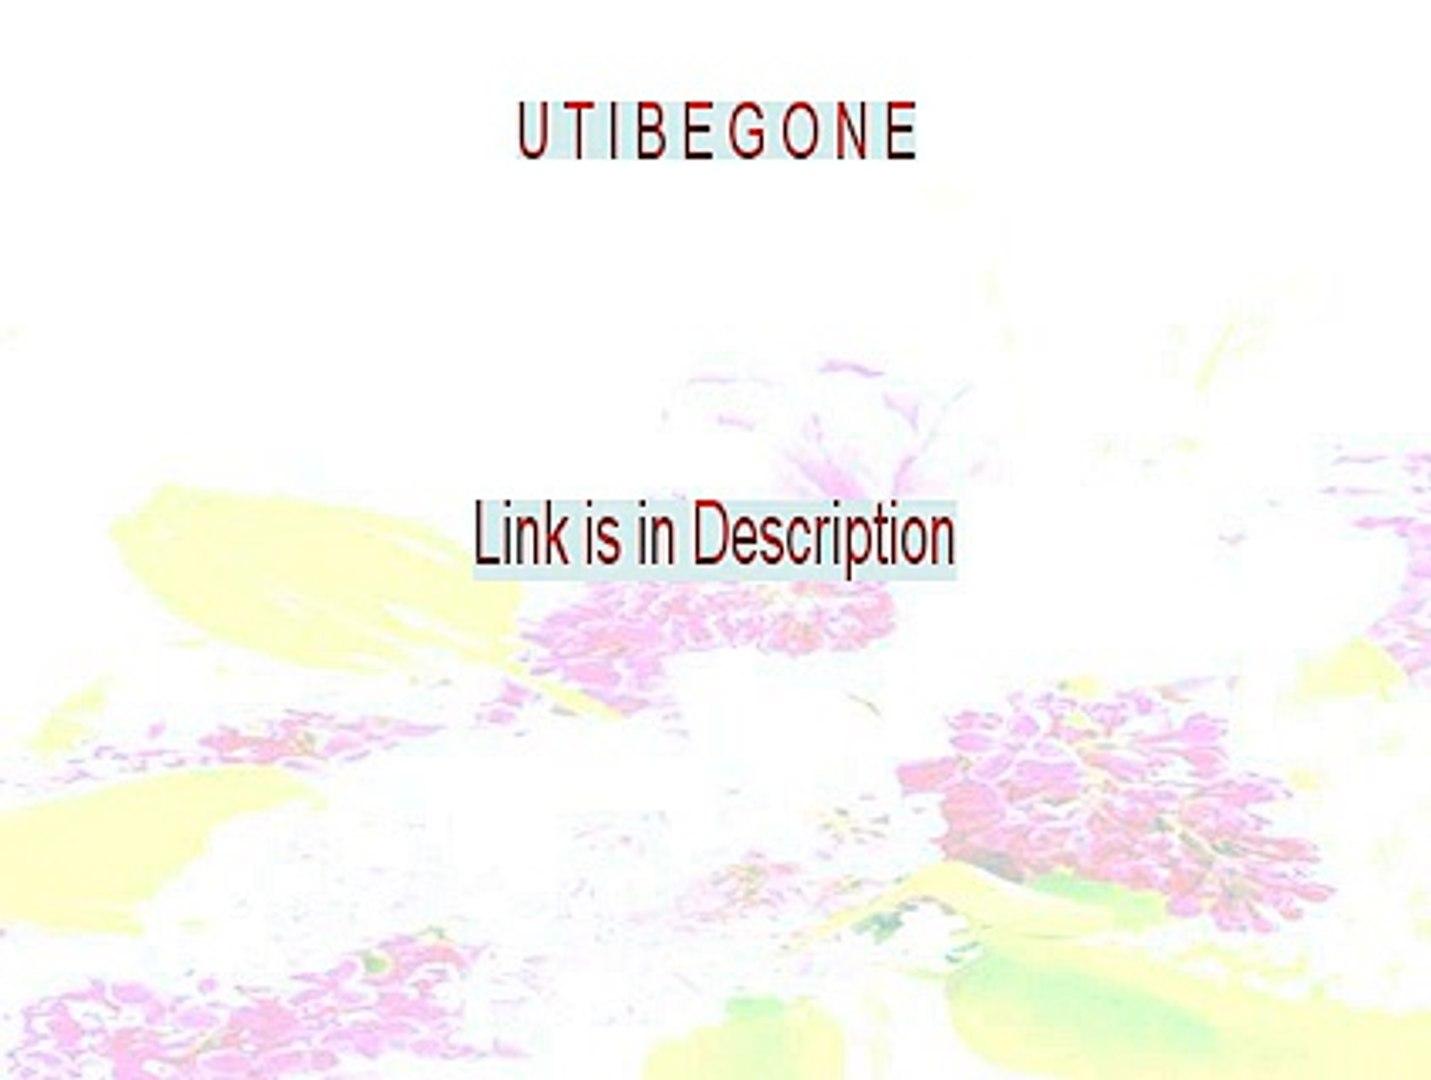 U T I B E G O N E Download PDF - U T I B E G O N E [2015]